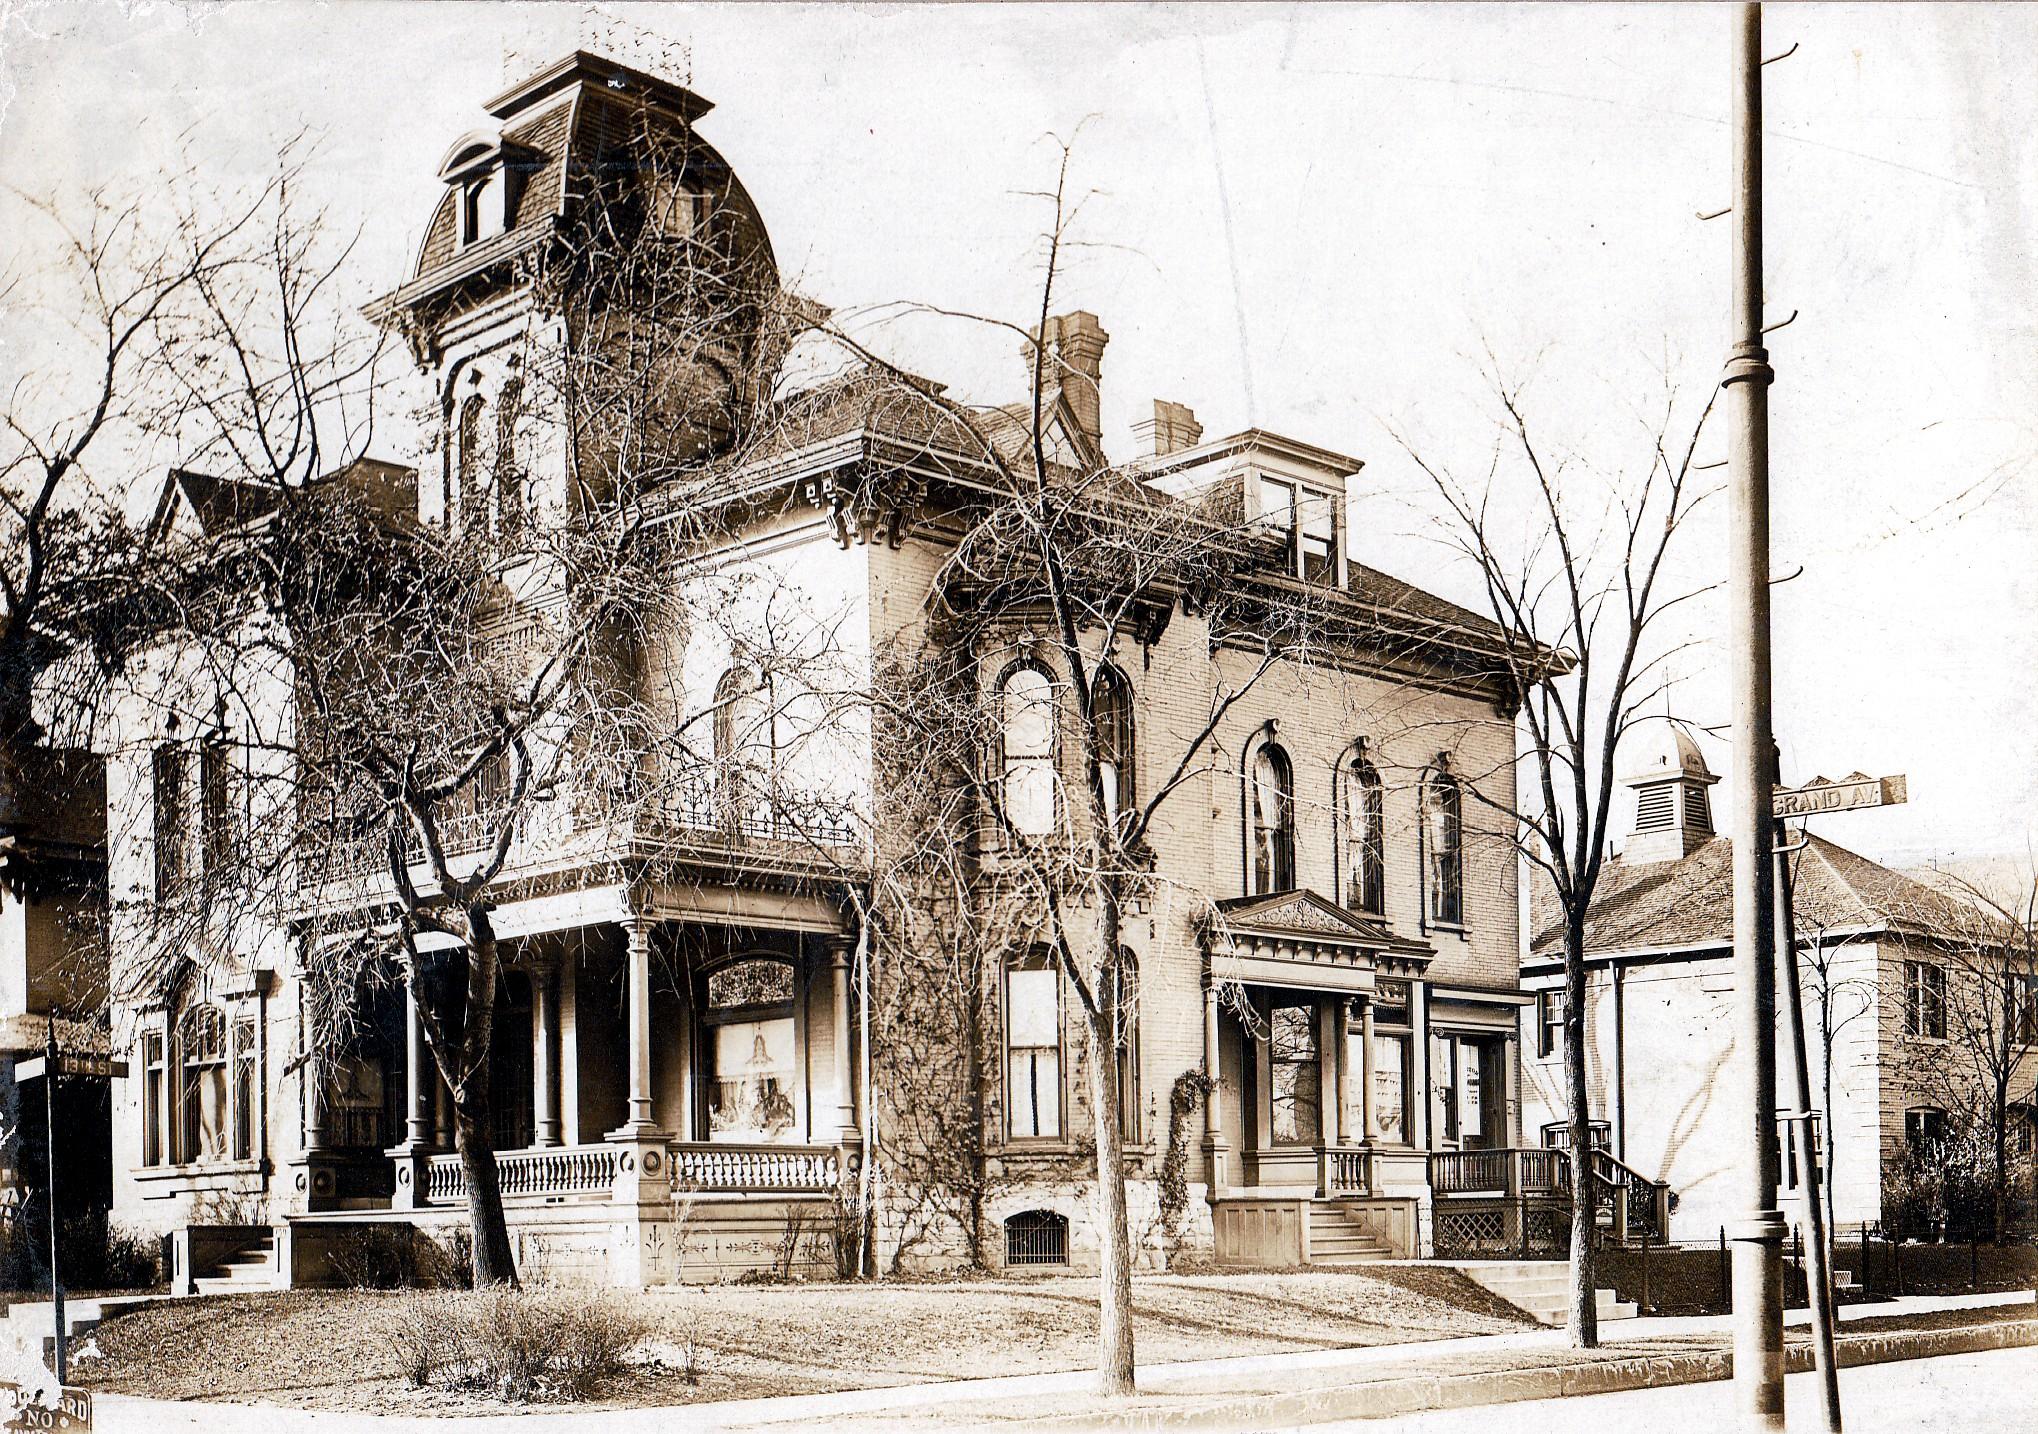 Alonzo Matthews Residence (1300 Grand Avenue), Milwaukee, Wisconsin, ca. 1900. Courtesy Carl Backus, via The Pabst Mansion.